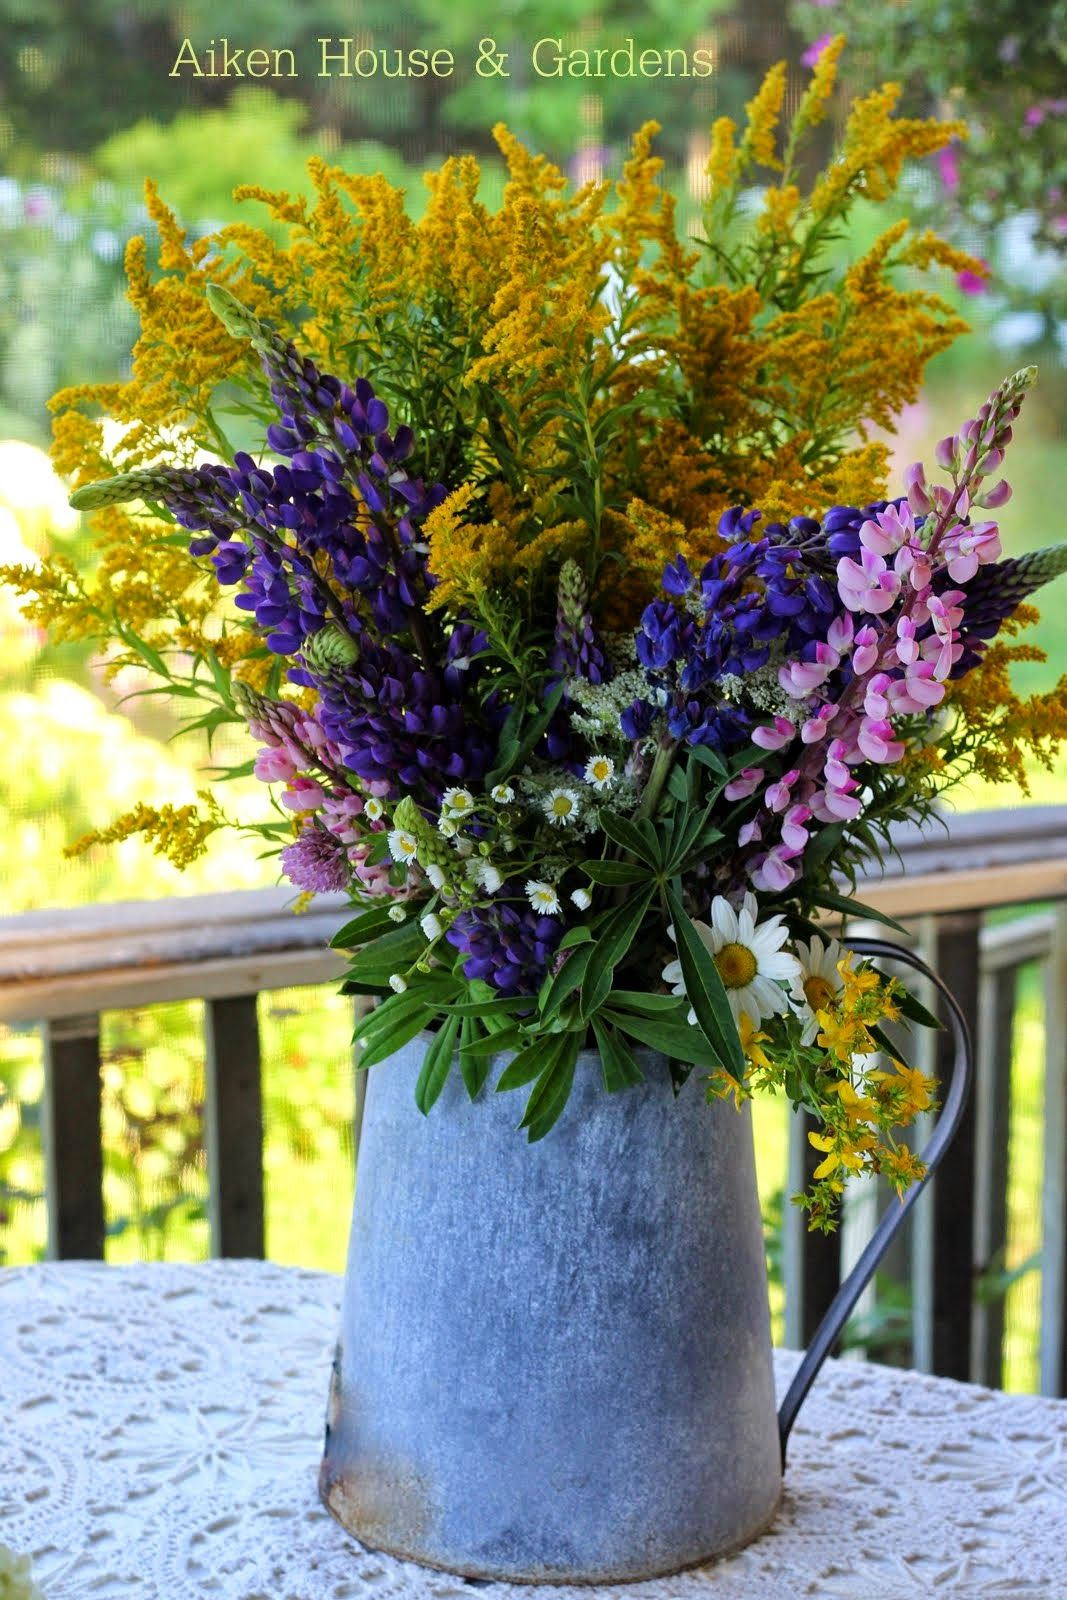 Aiken House Amp Gardens Late Summer Bouquets Gifty Gardener Items Front Porch Flowers Garden